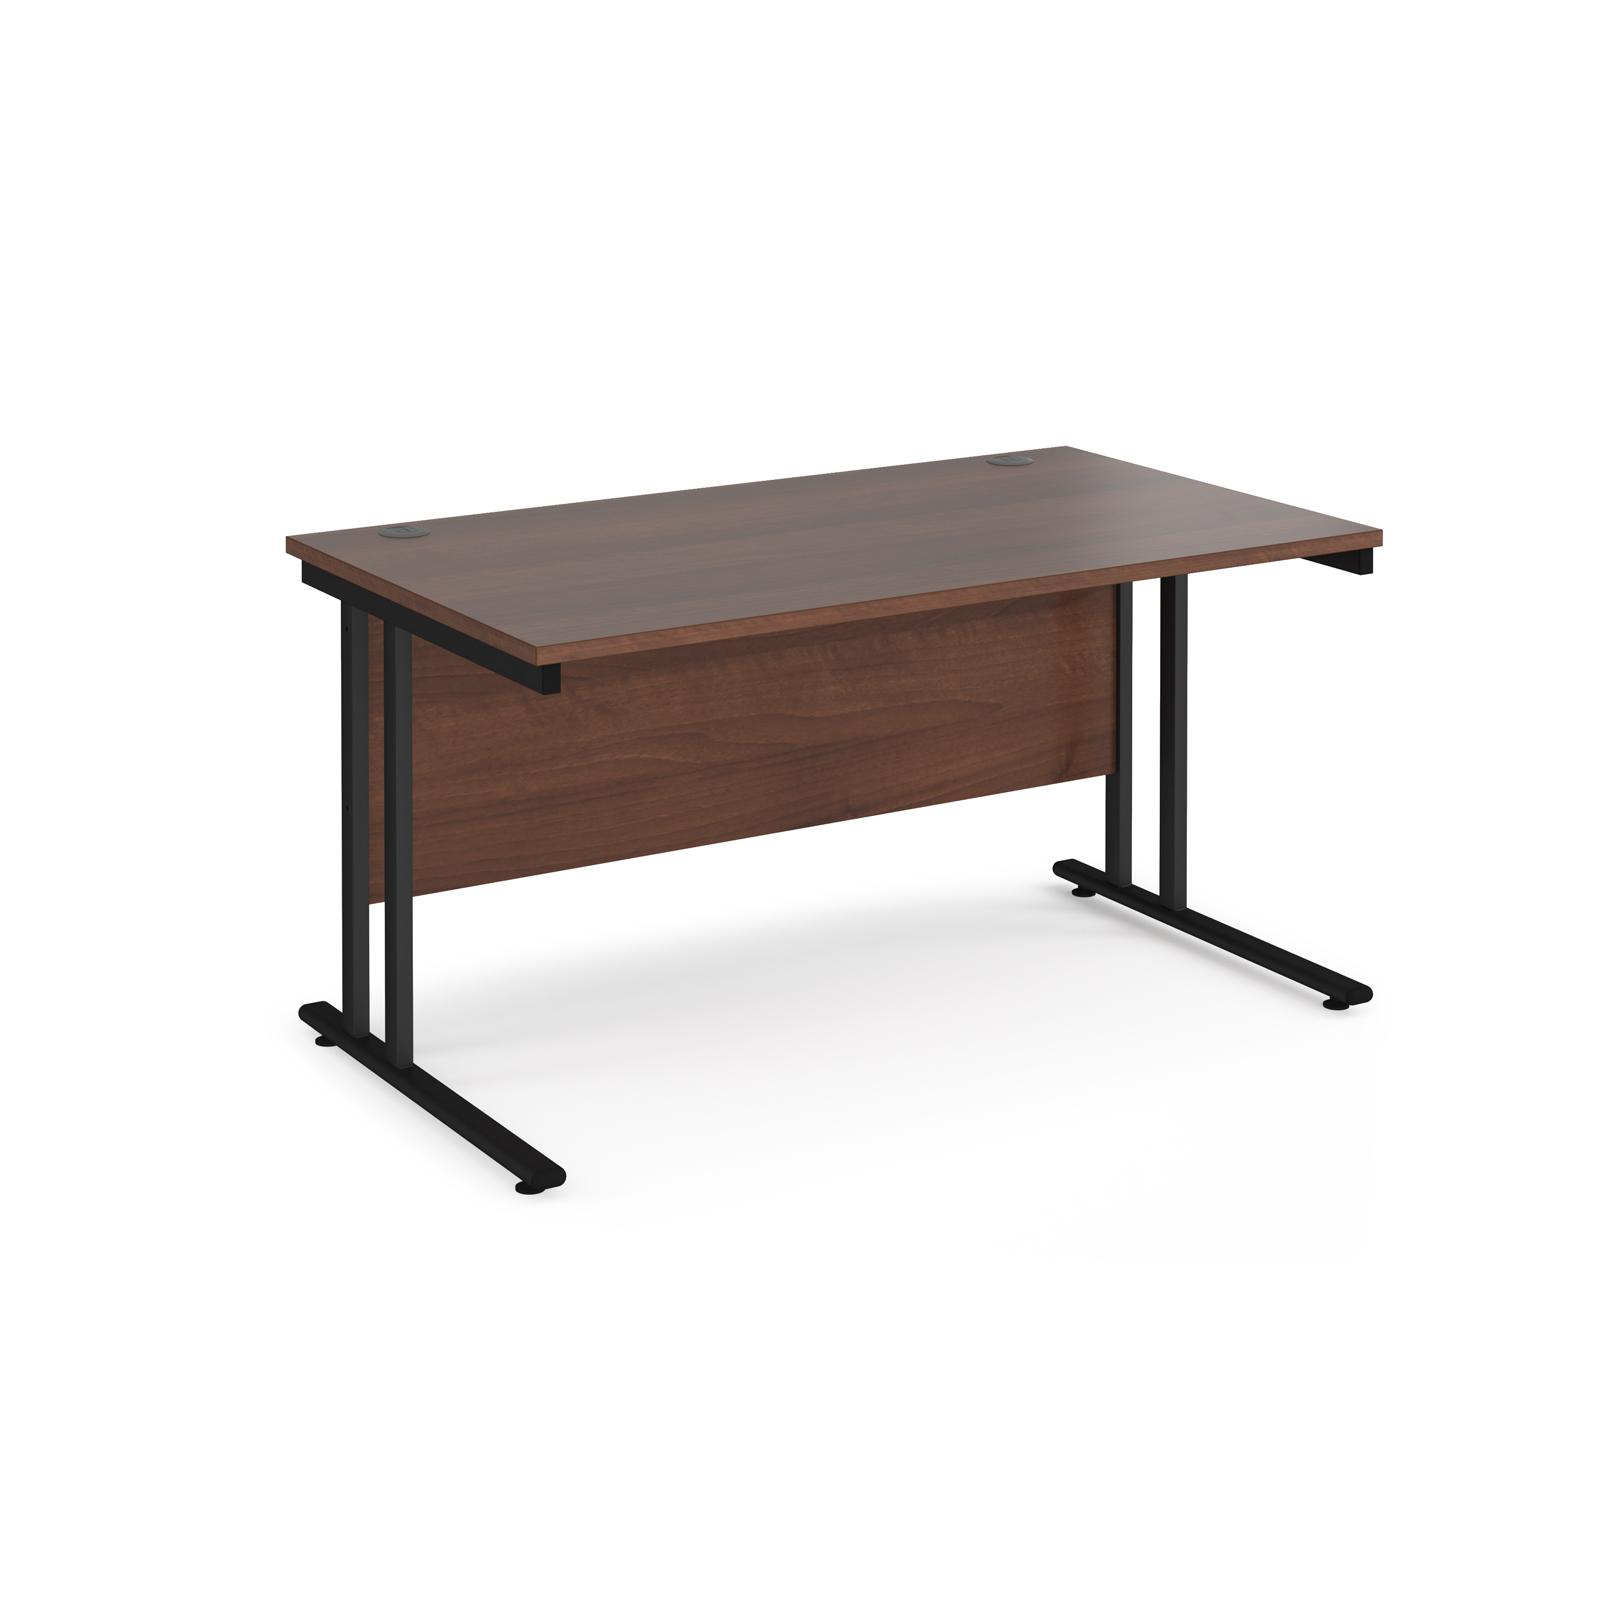 Rectangular Desks Maestro 25 straight desk 1400mm x 800mm - black cantilever leg frame, walnut top